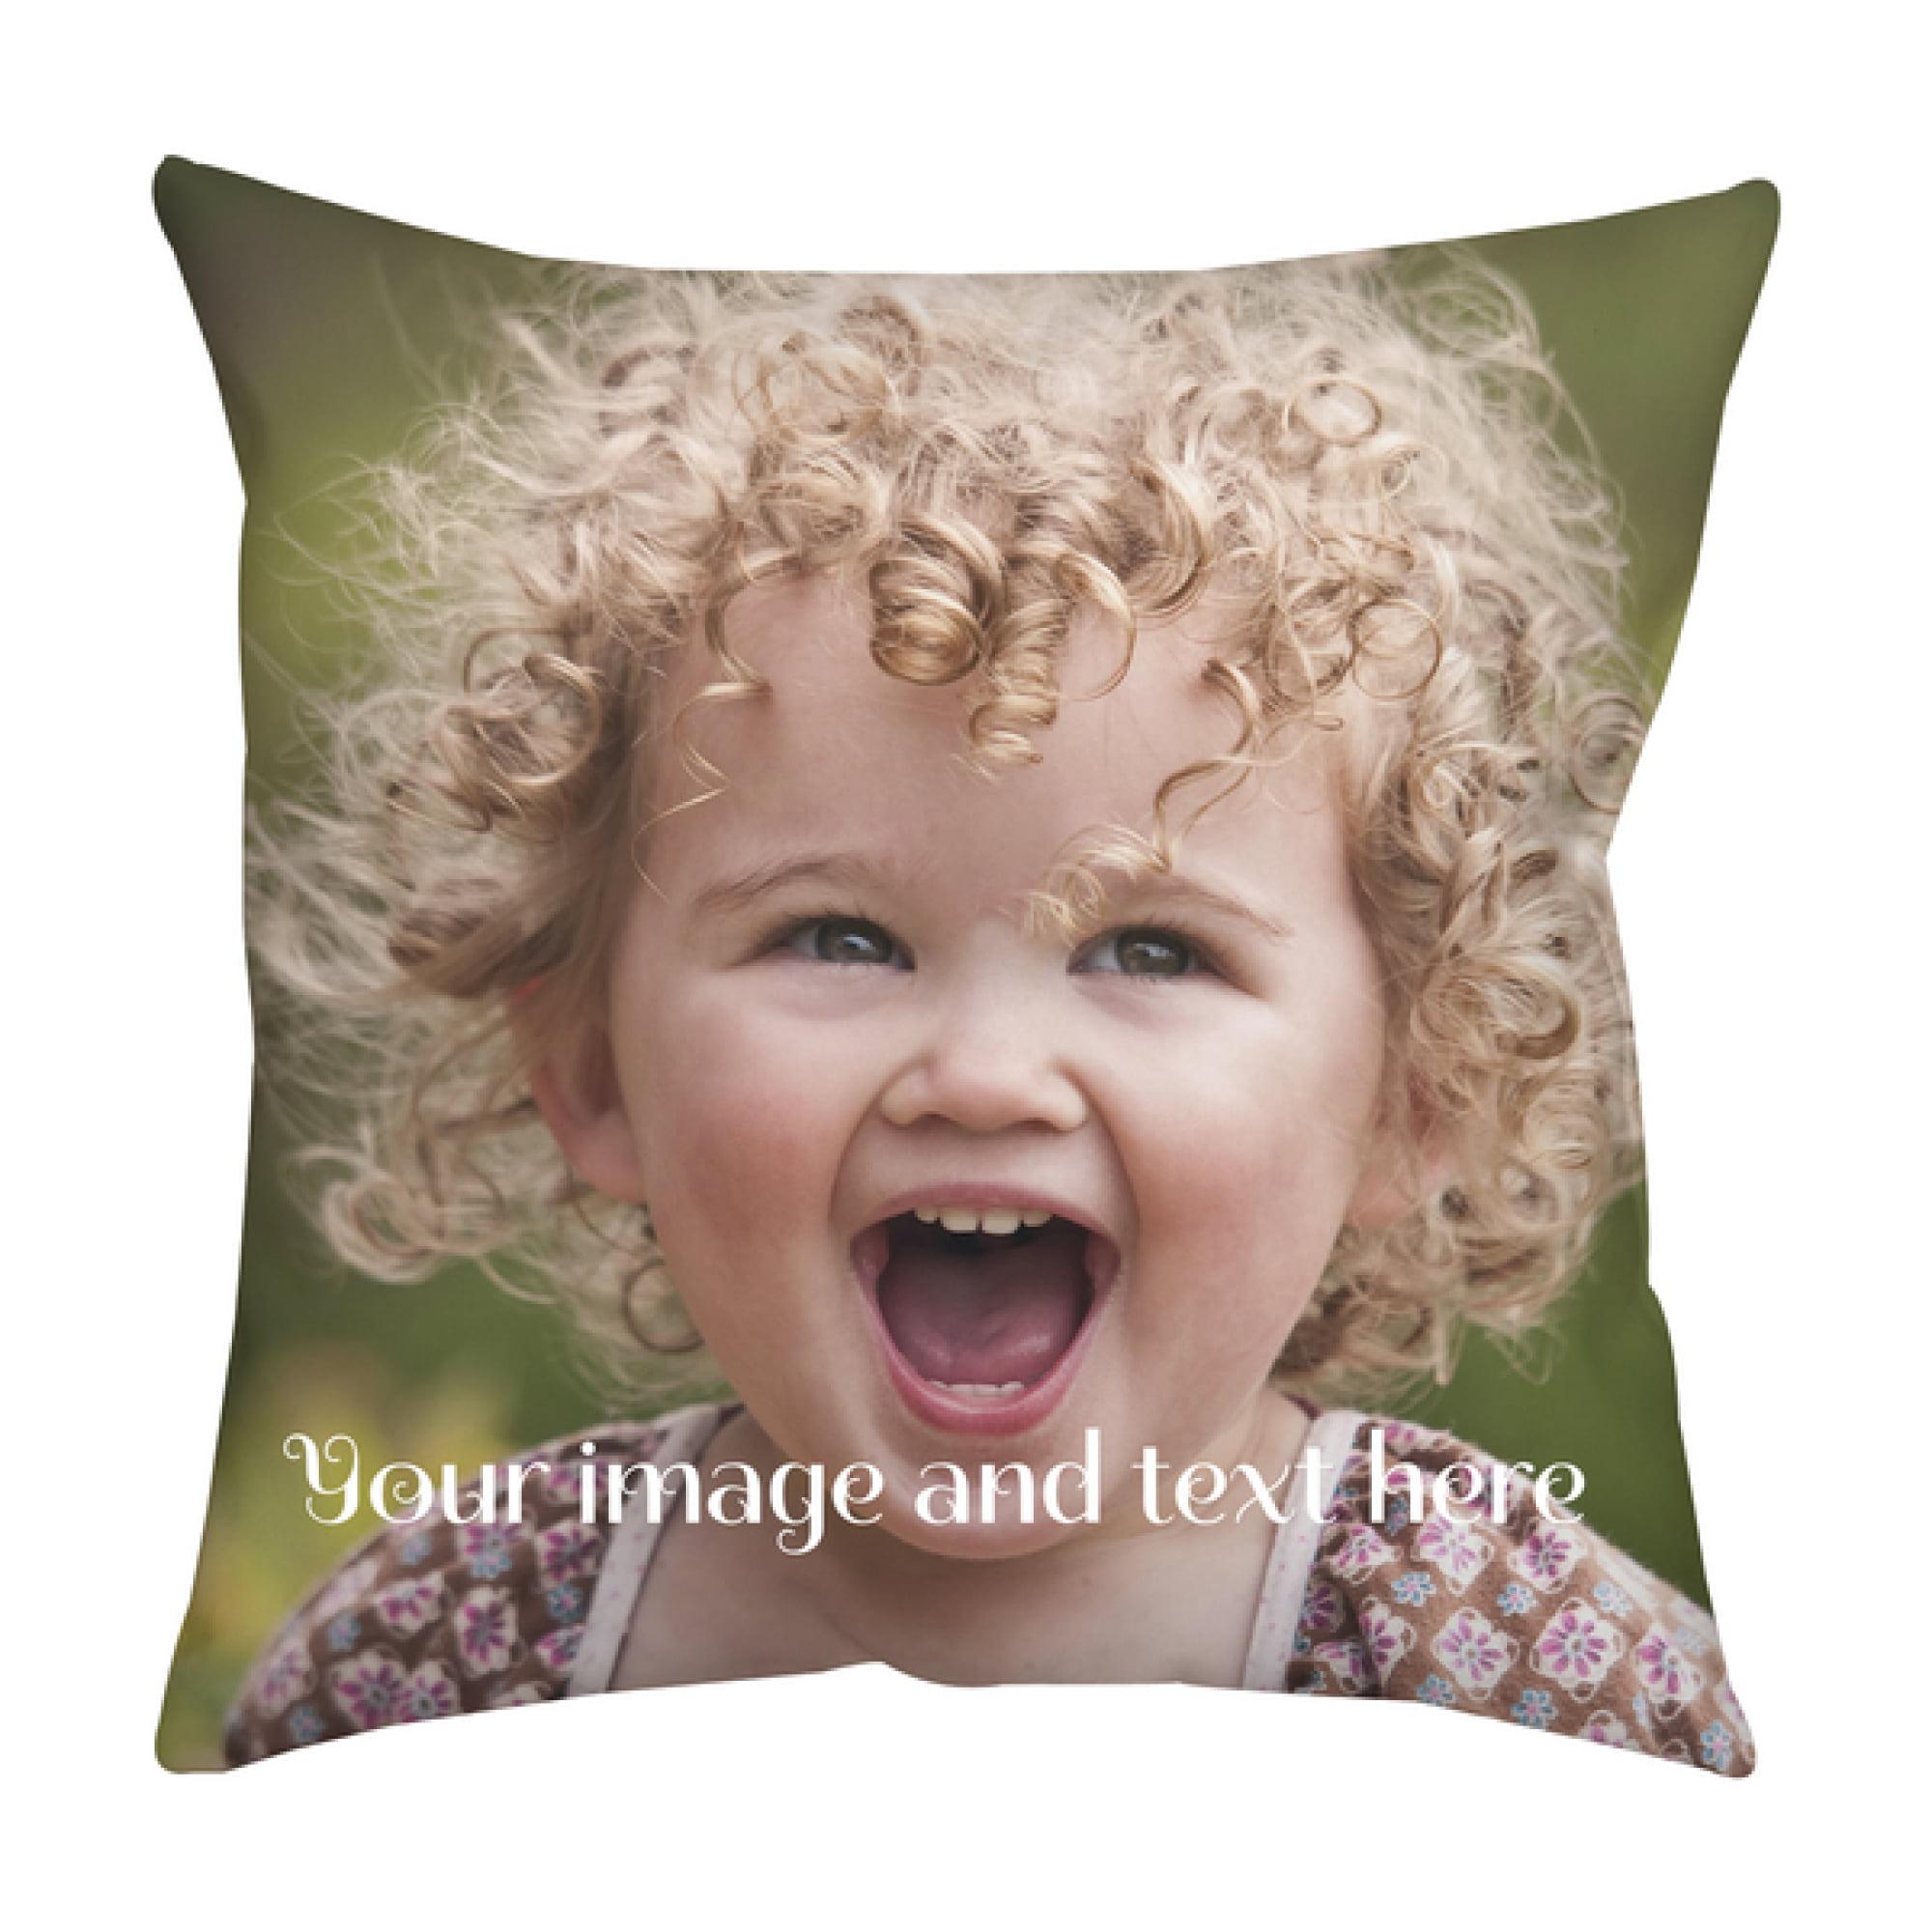 Personalized Photo Burlap Pillow-2 sided print-zipper